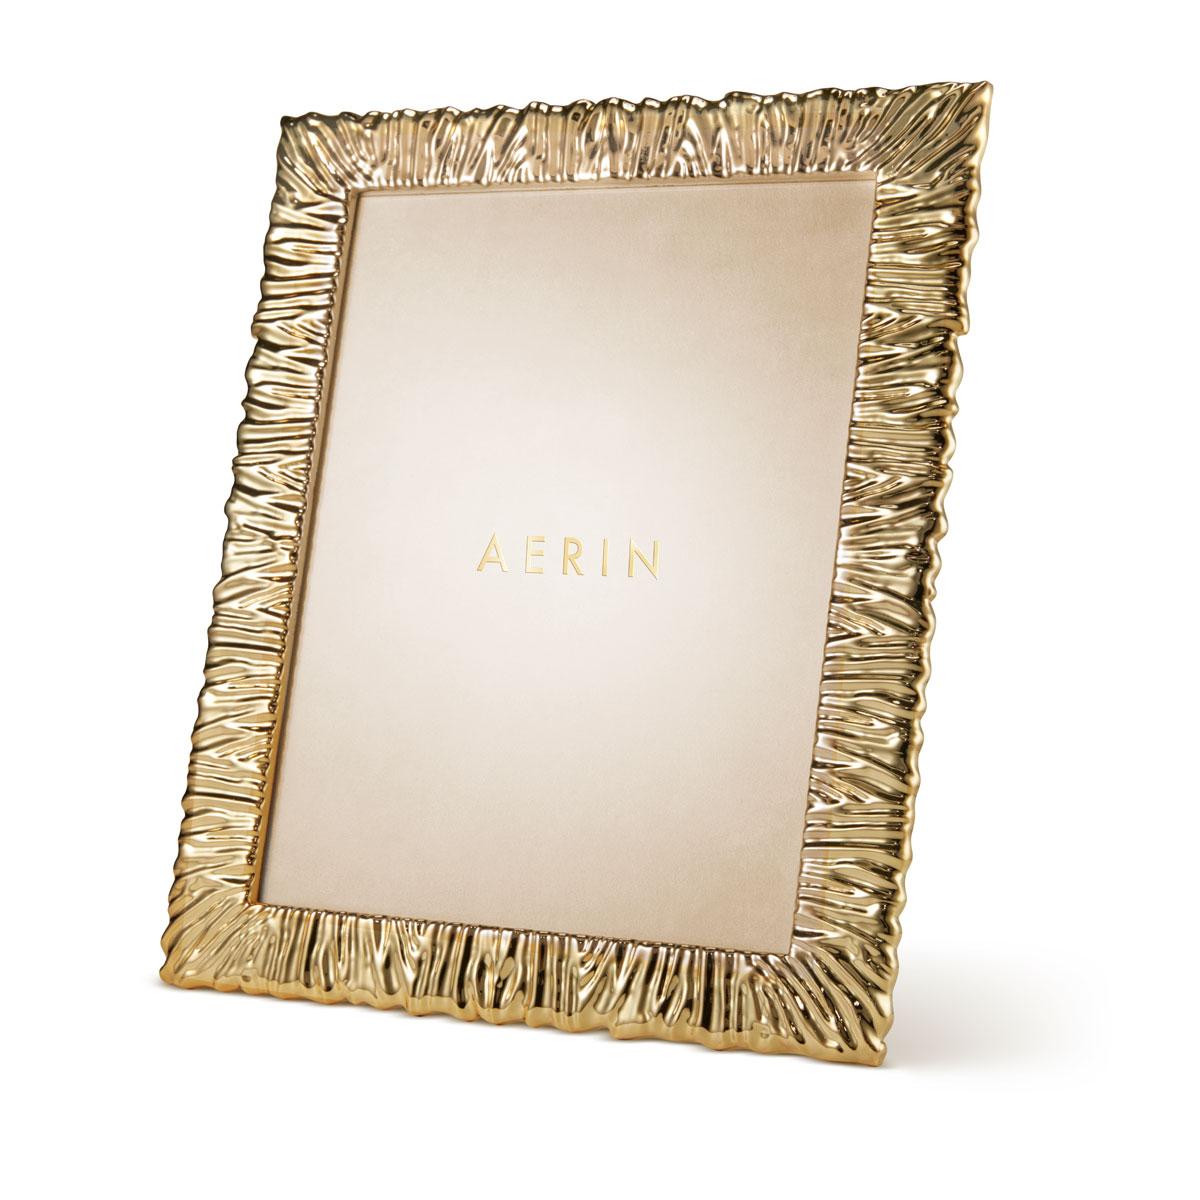 "Aerin Ambroise Gold Frame 8x10"""